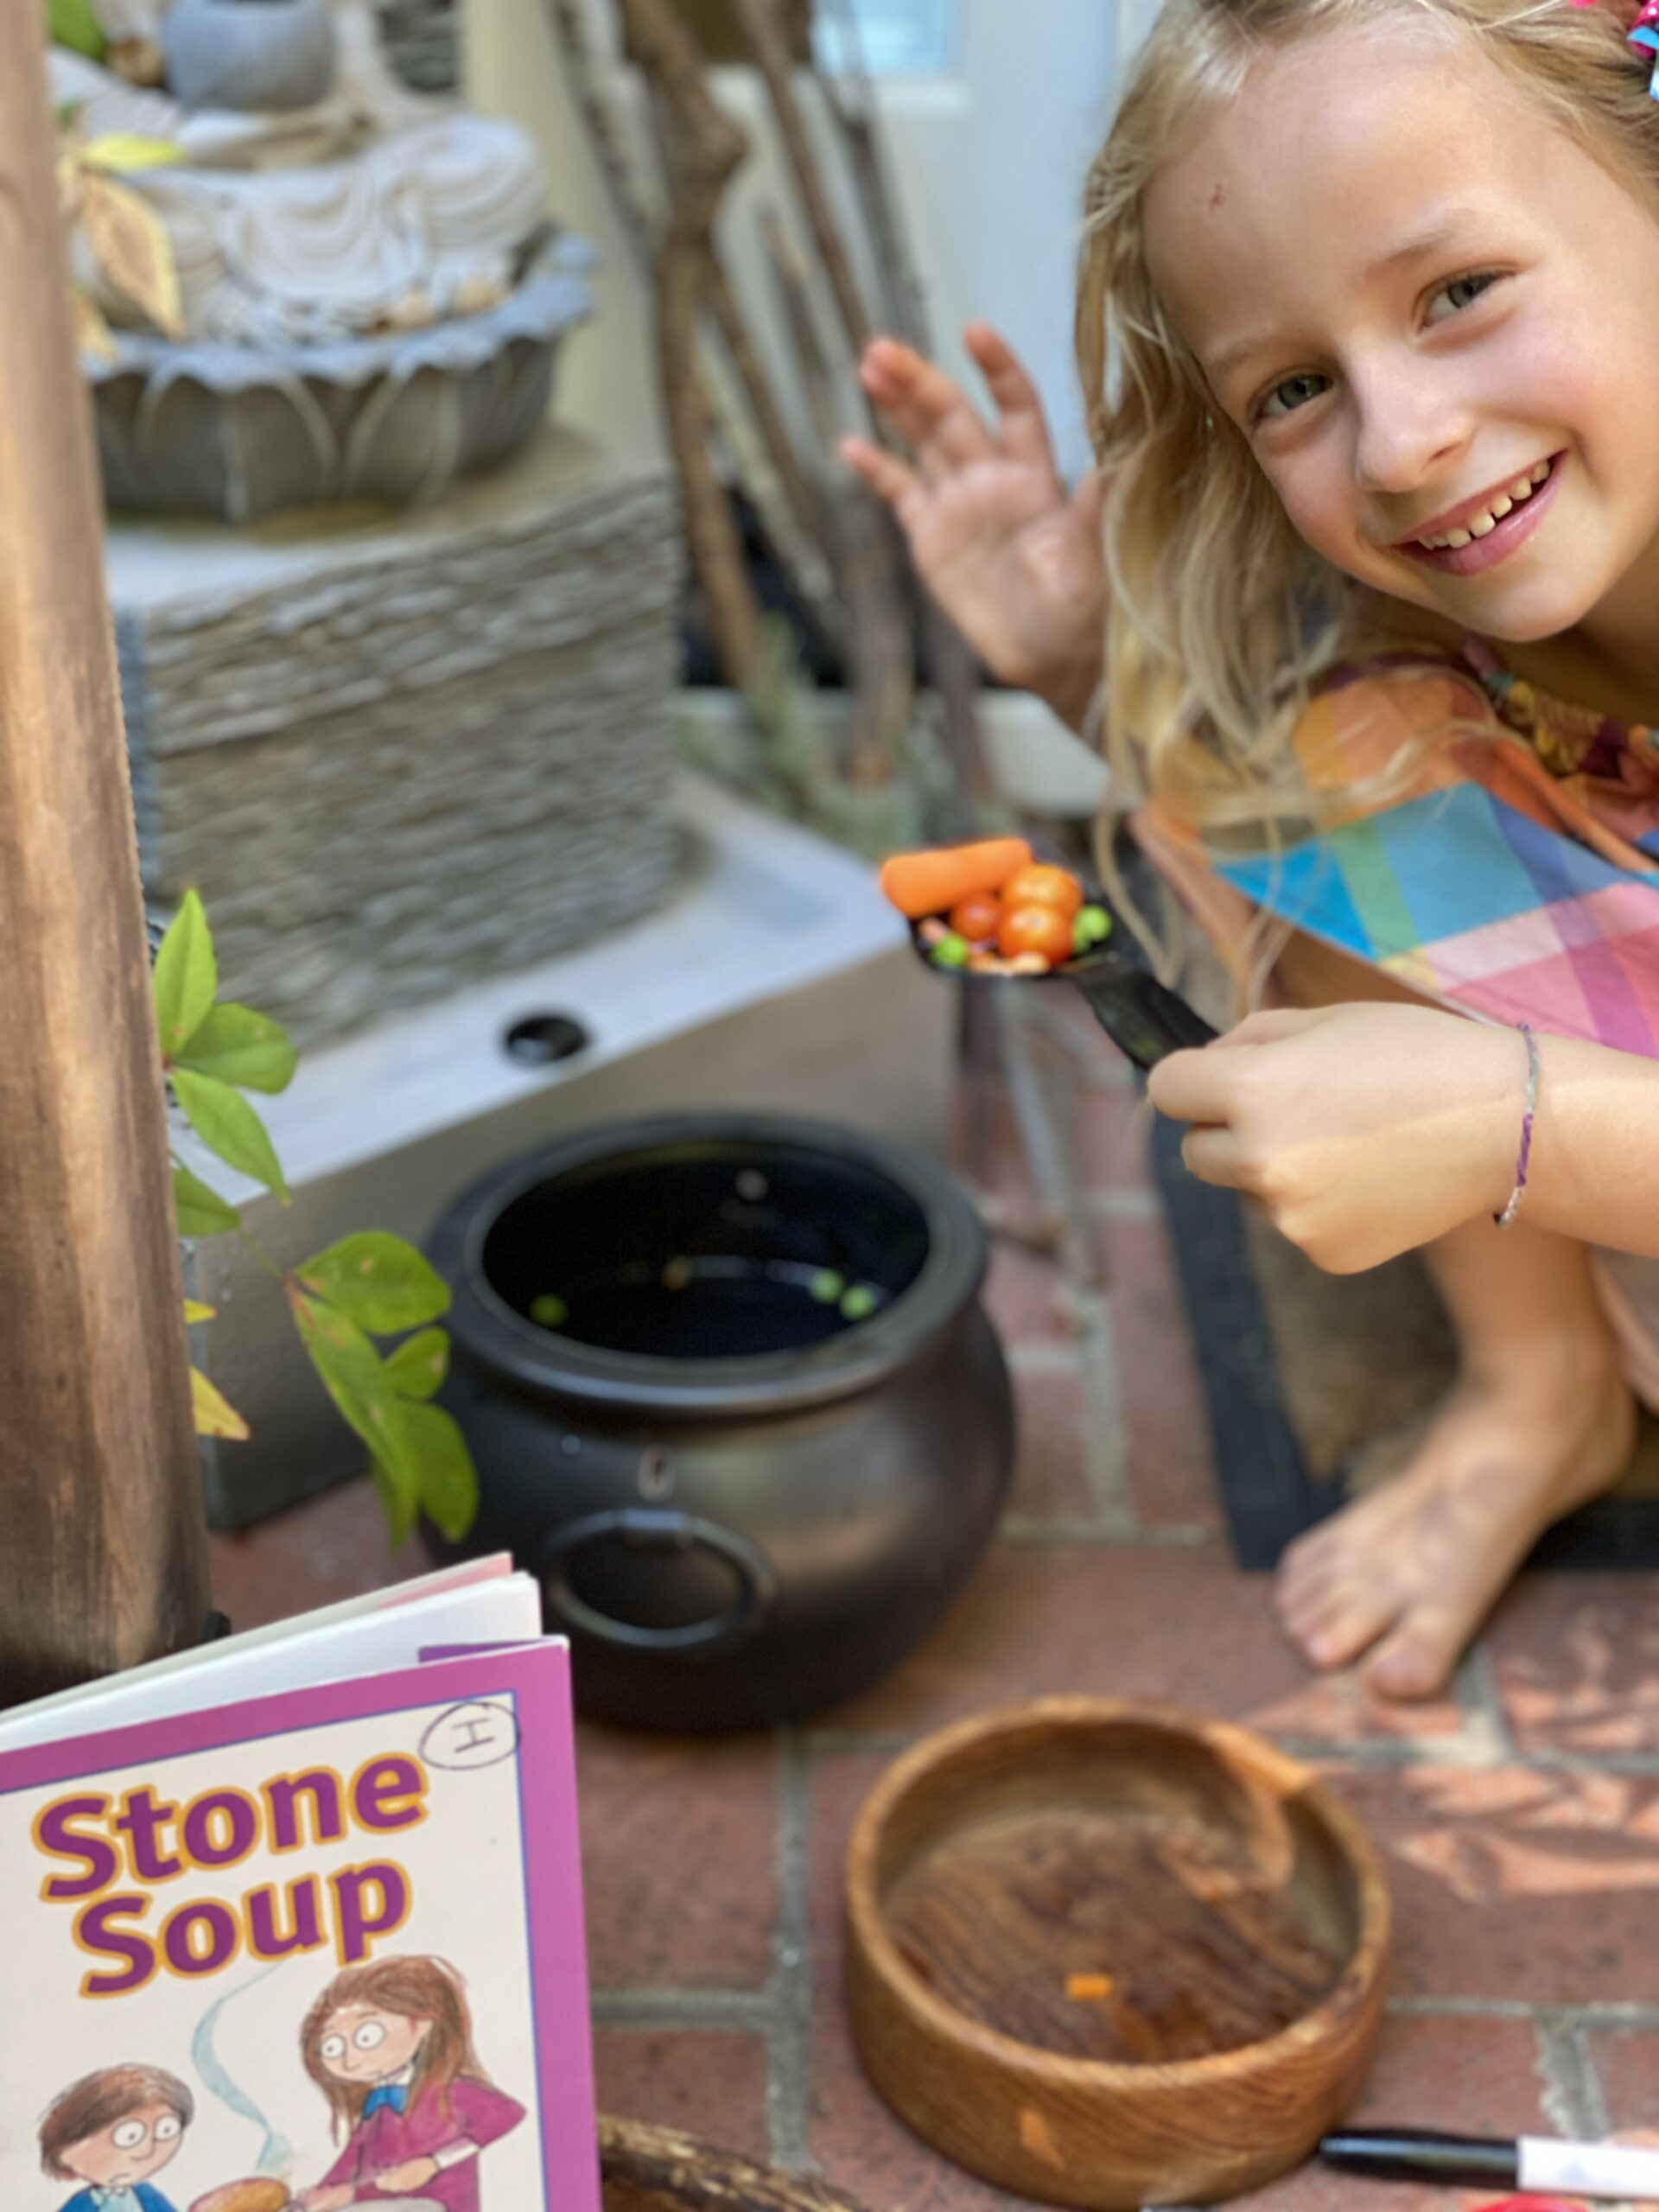 Child preparing stone soup.